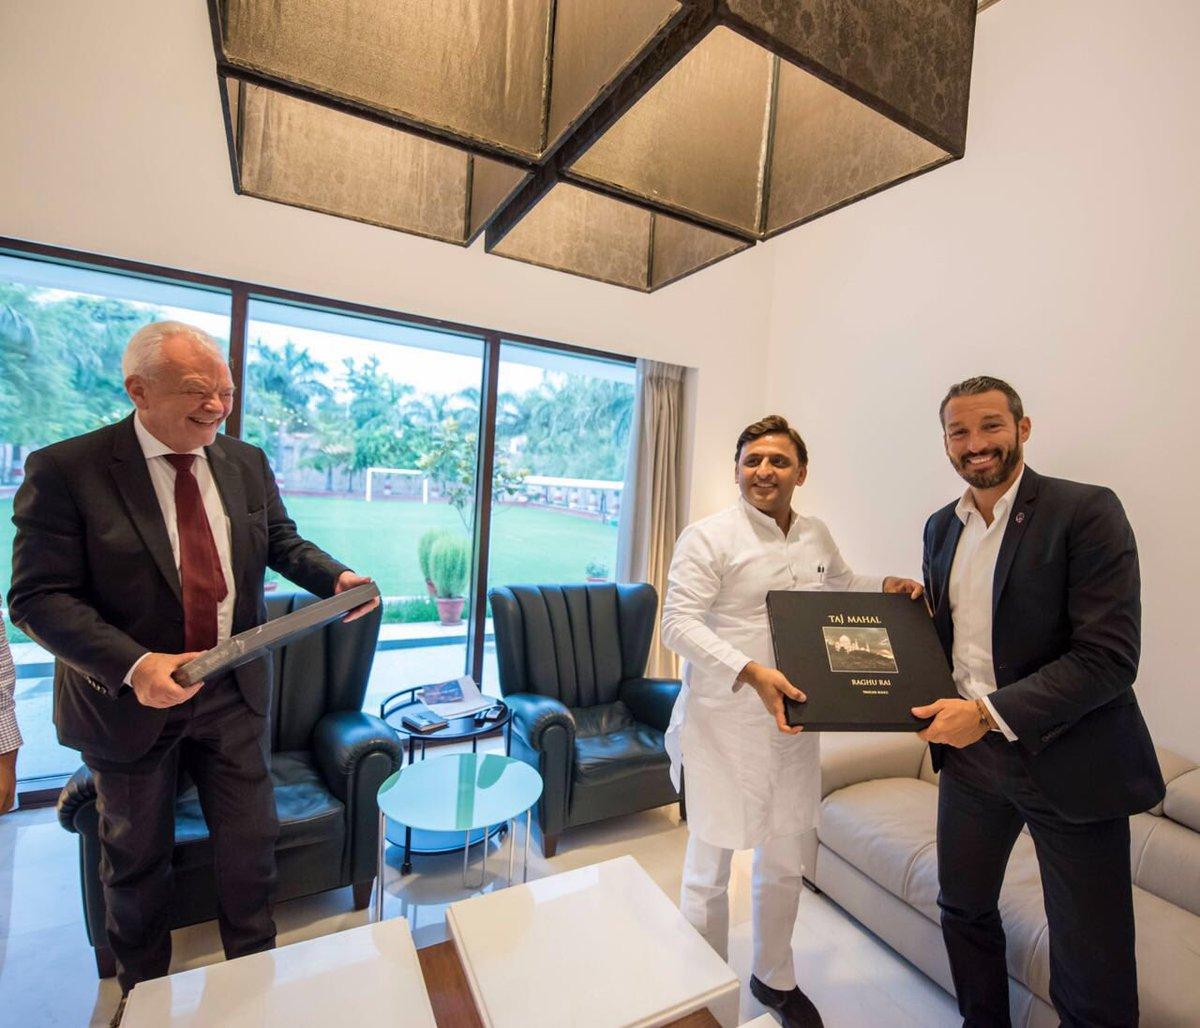 Chief Minister Akhilesh Yadav visit with the Italian footballer Gianluca Zambrotta and Harald Sandberg, the Swedish ambassador